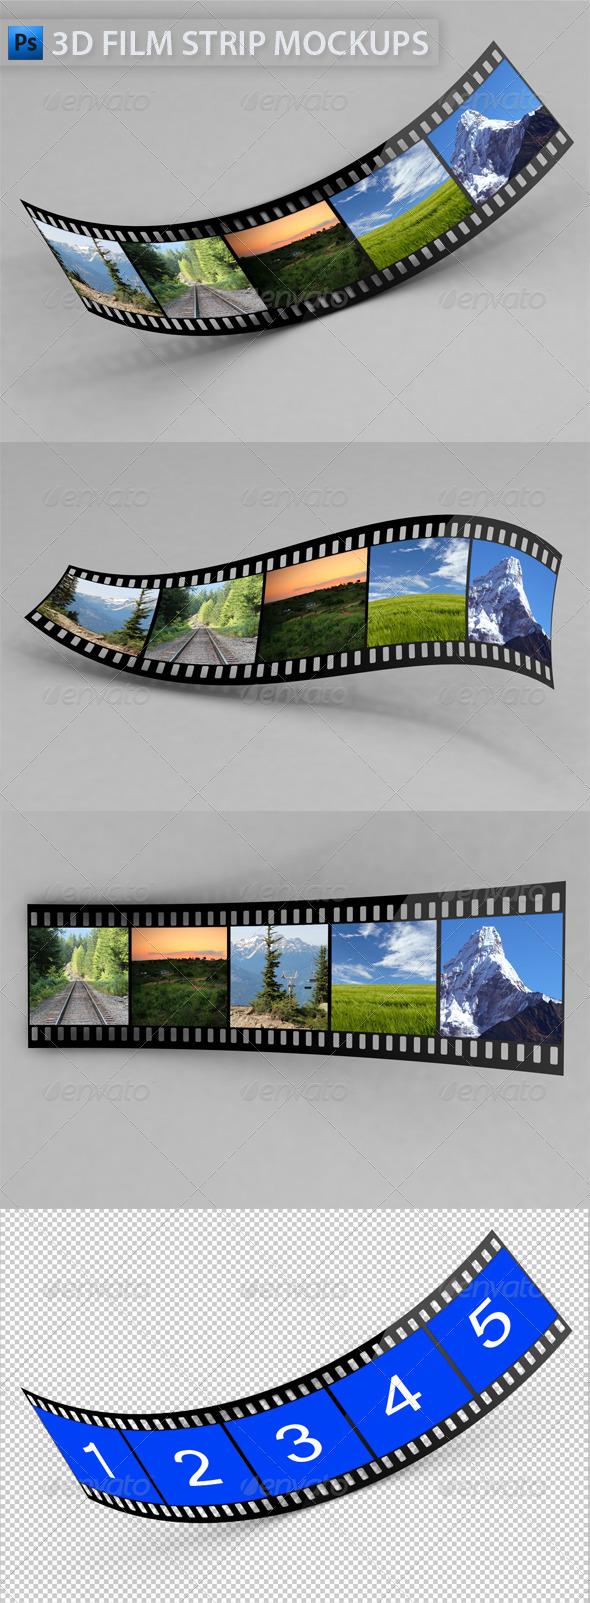 3D Film Strip Mock-Ups - Miscellaneous Photo Templates